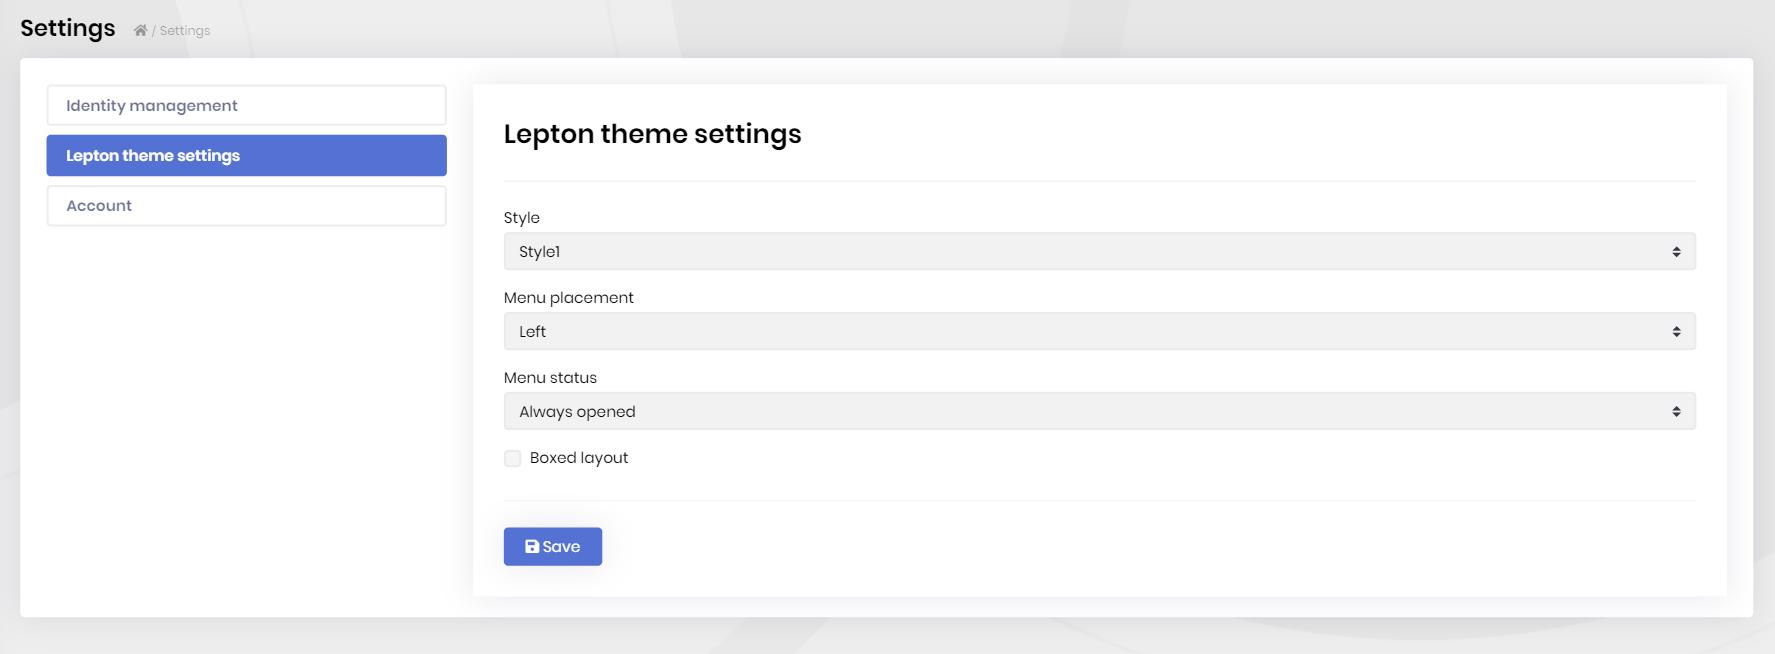 lepton-theme-module-settings-page